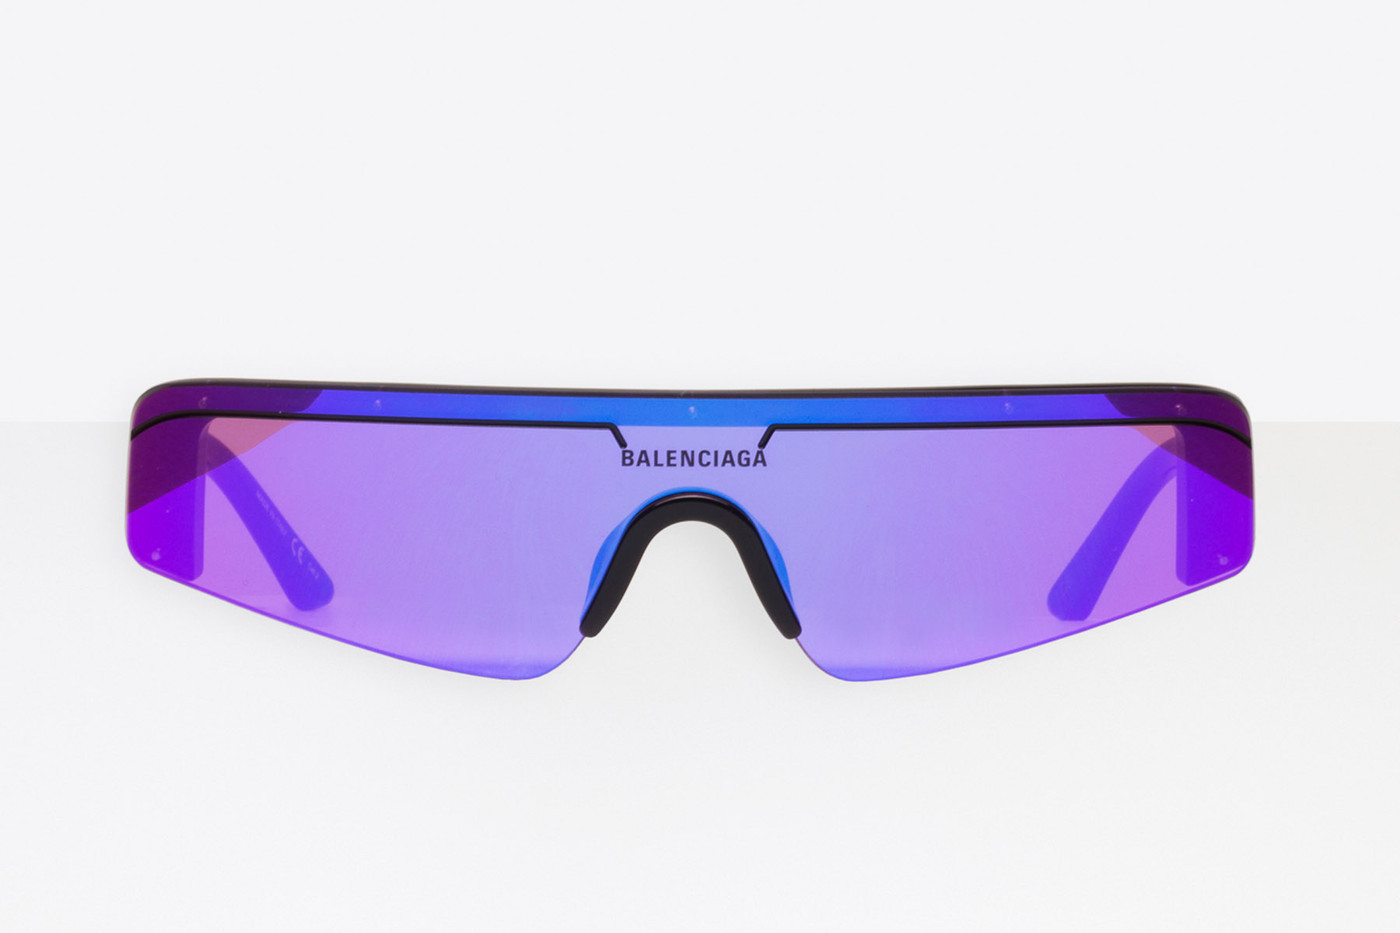 Balenciaga Kering Eyewear Sunglasses